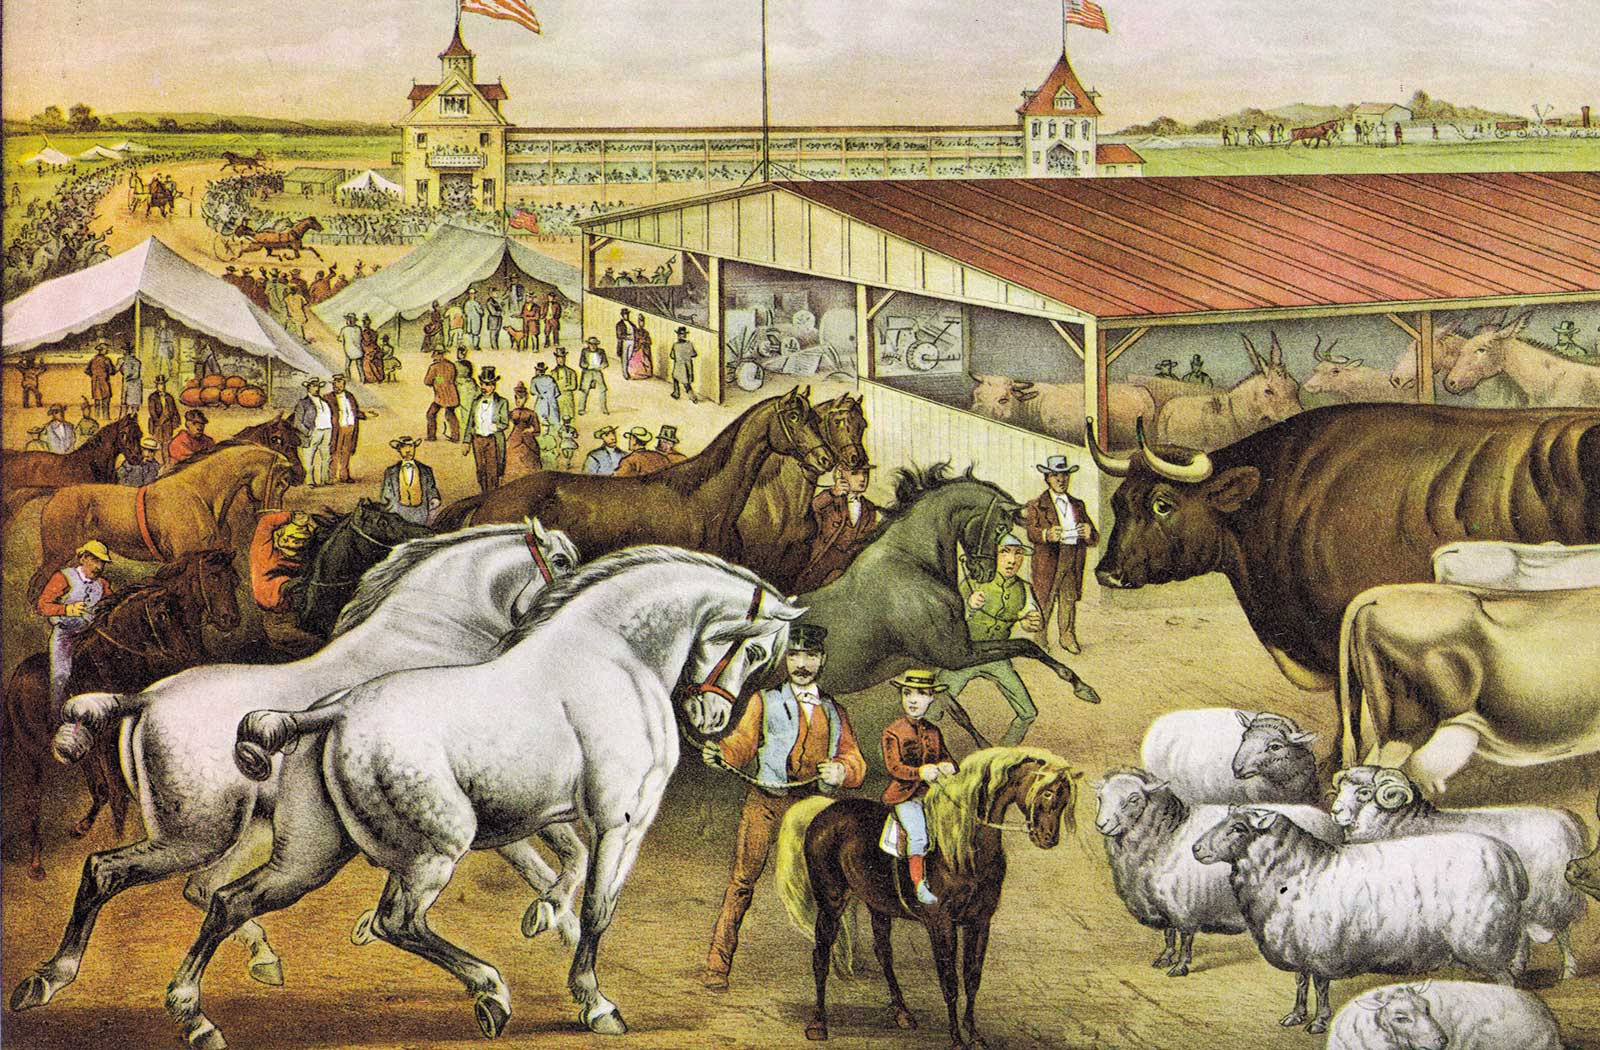 The Dutchess County Fairgrounds – Home Of The Dutchess Fair Regarding Dutchess County Fair Ground 2021 Calendar